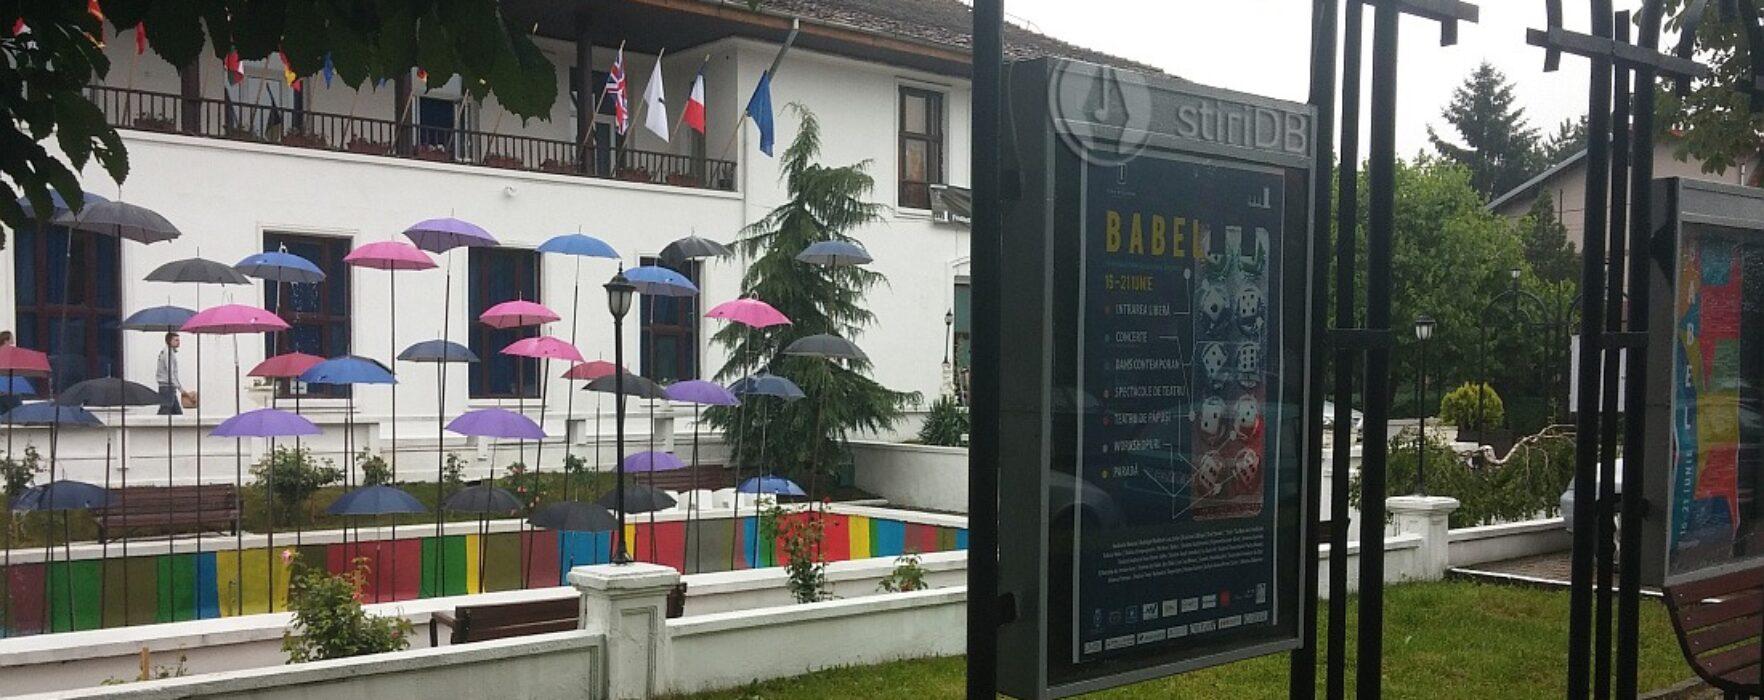 Târgoviște: Festivalul Babel 1-12 iunie; vezi programul